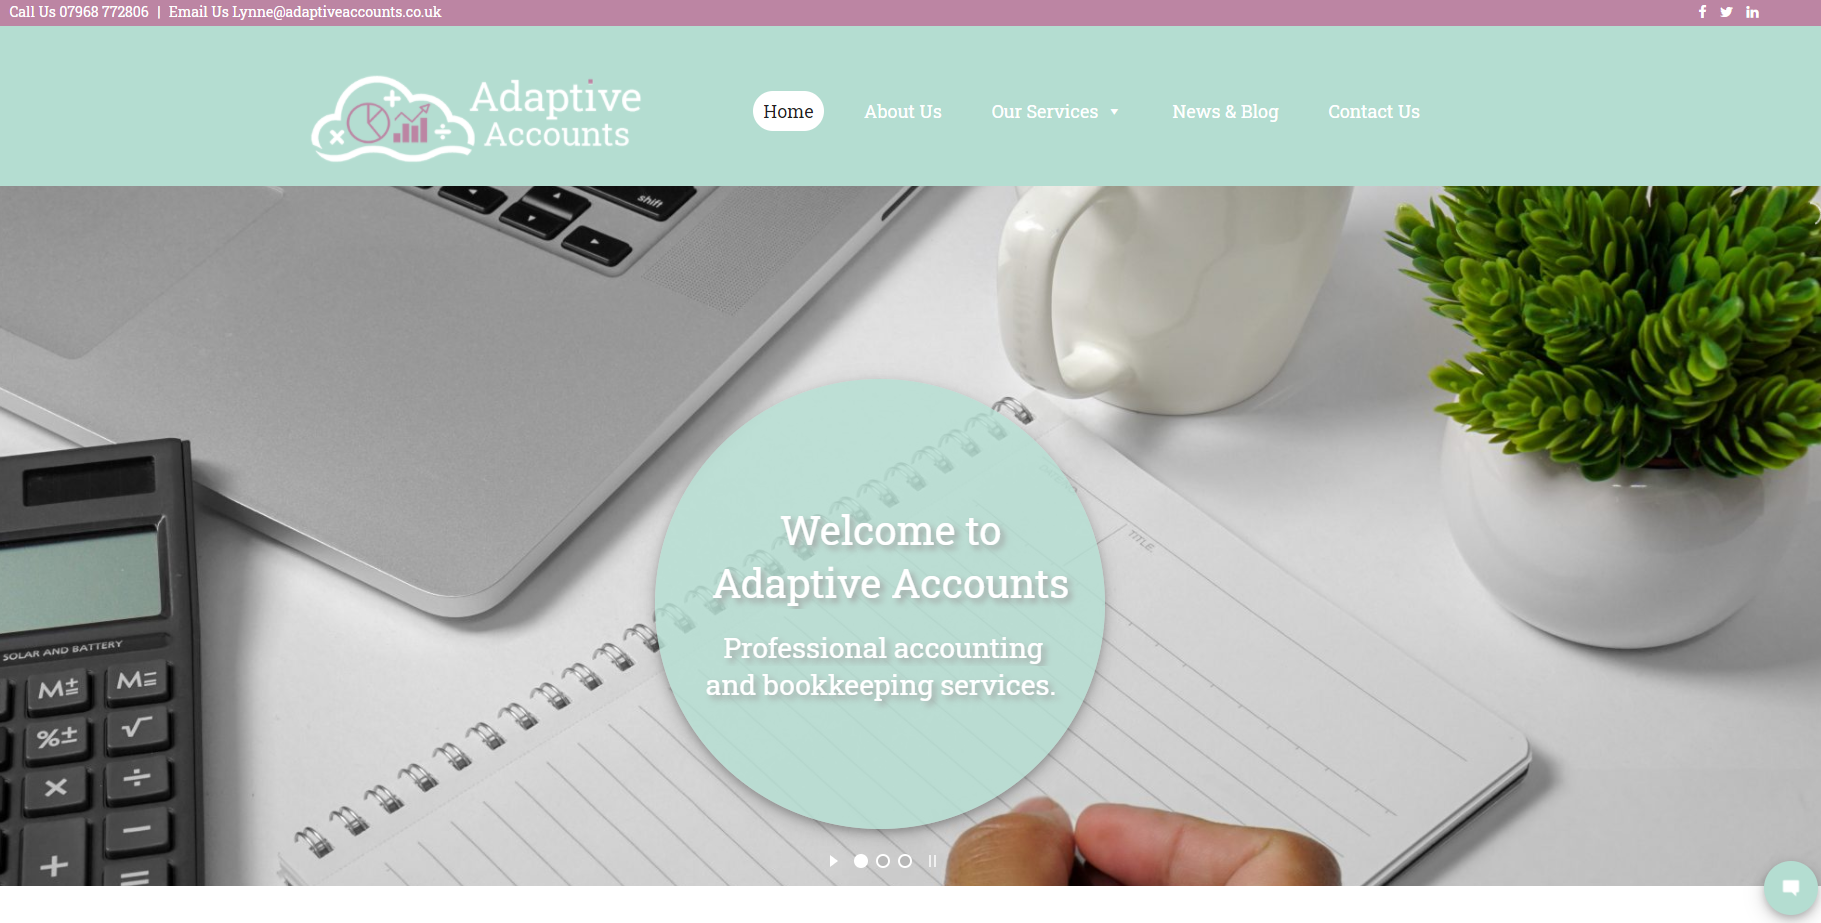 https://w2m.co.uk/project/adaptive-accounts/